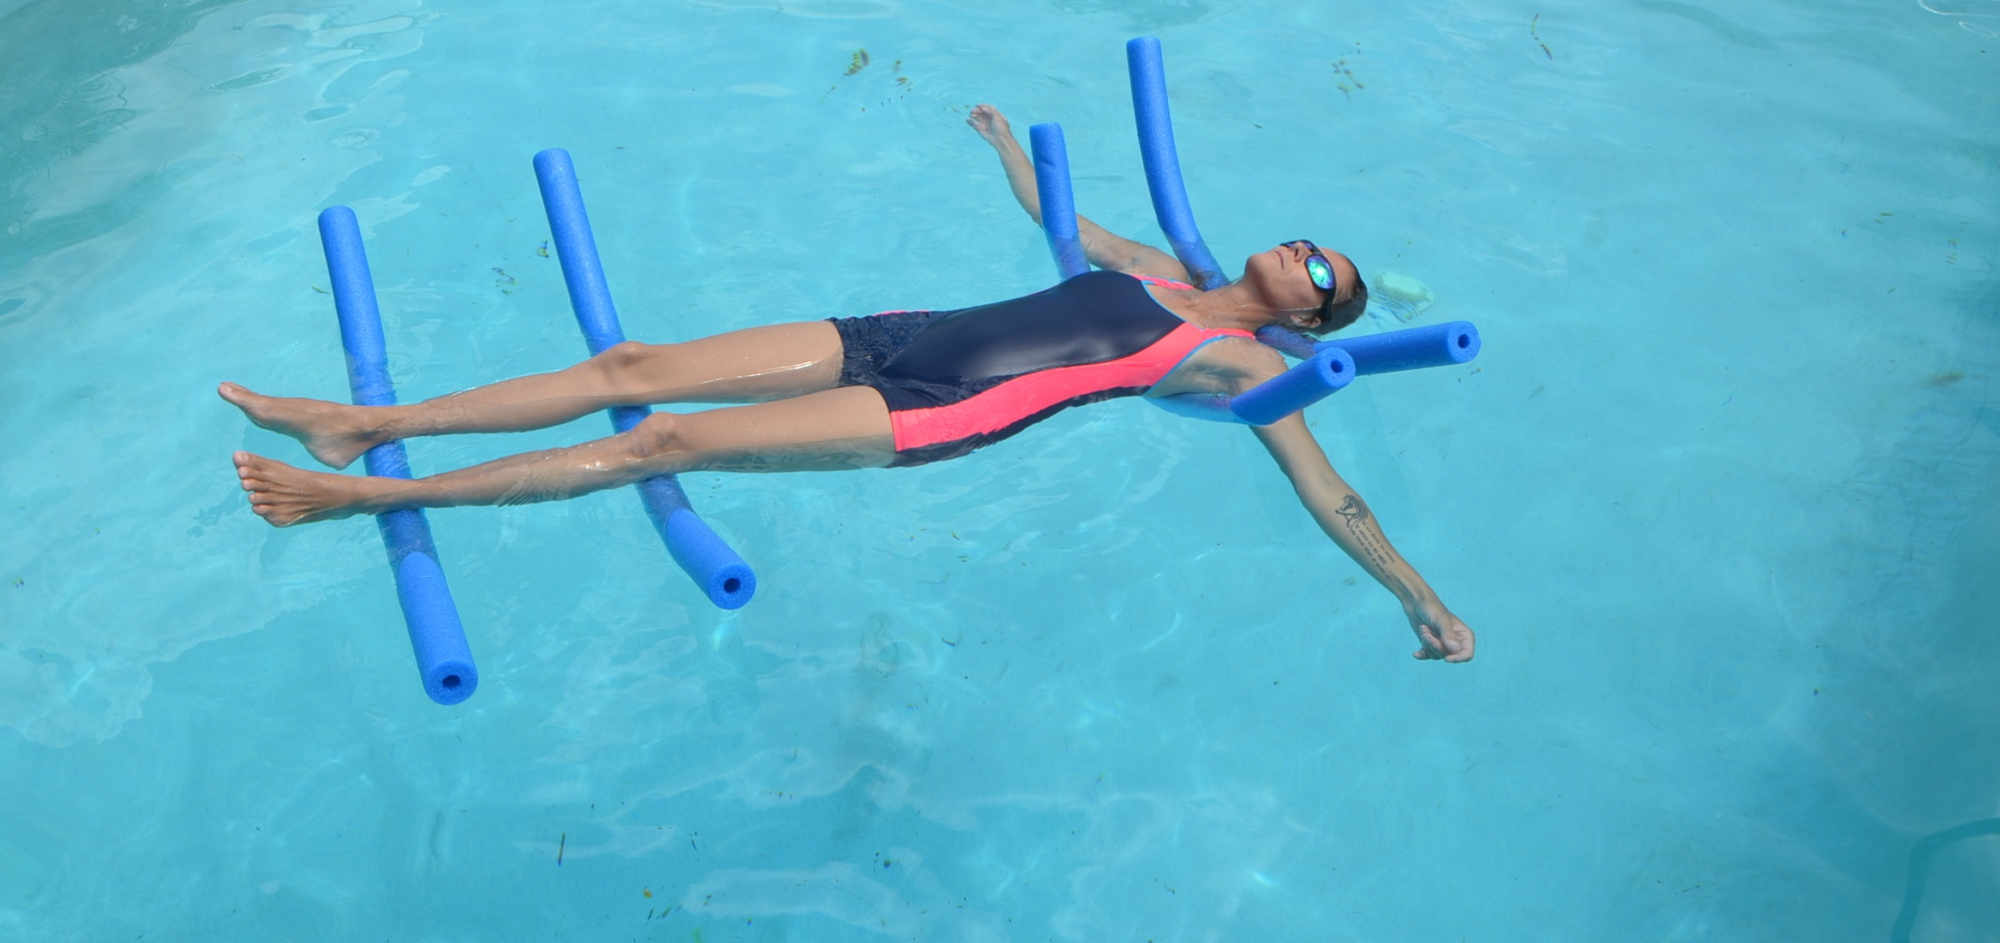 christa fairbrother doing aqua yoga in the pool